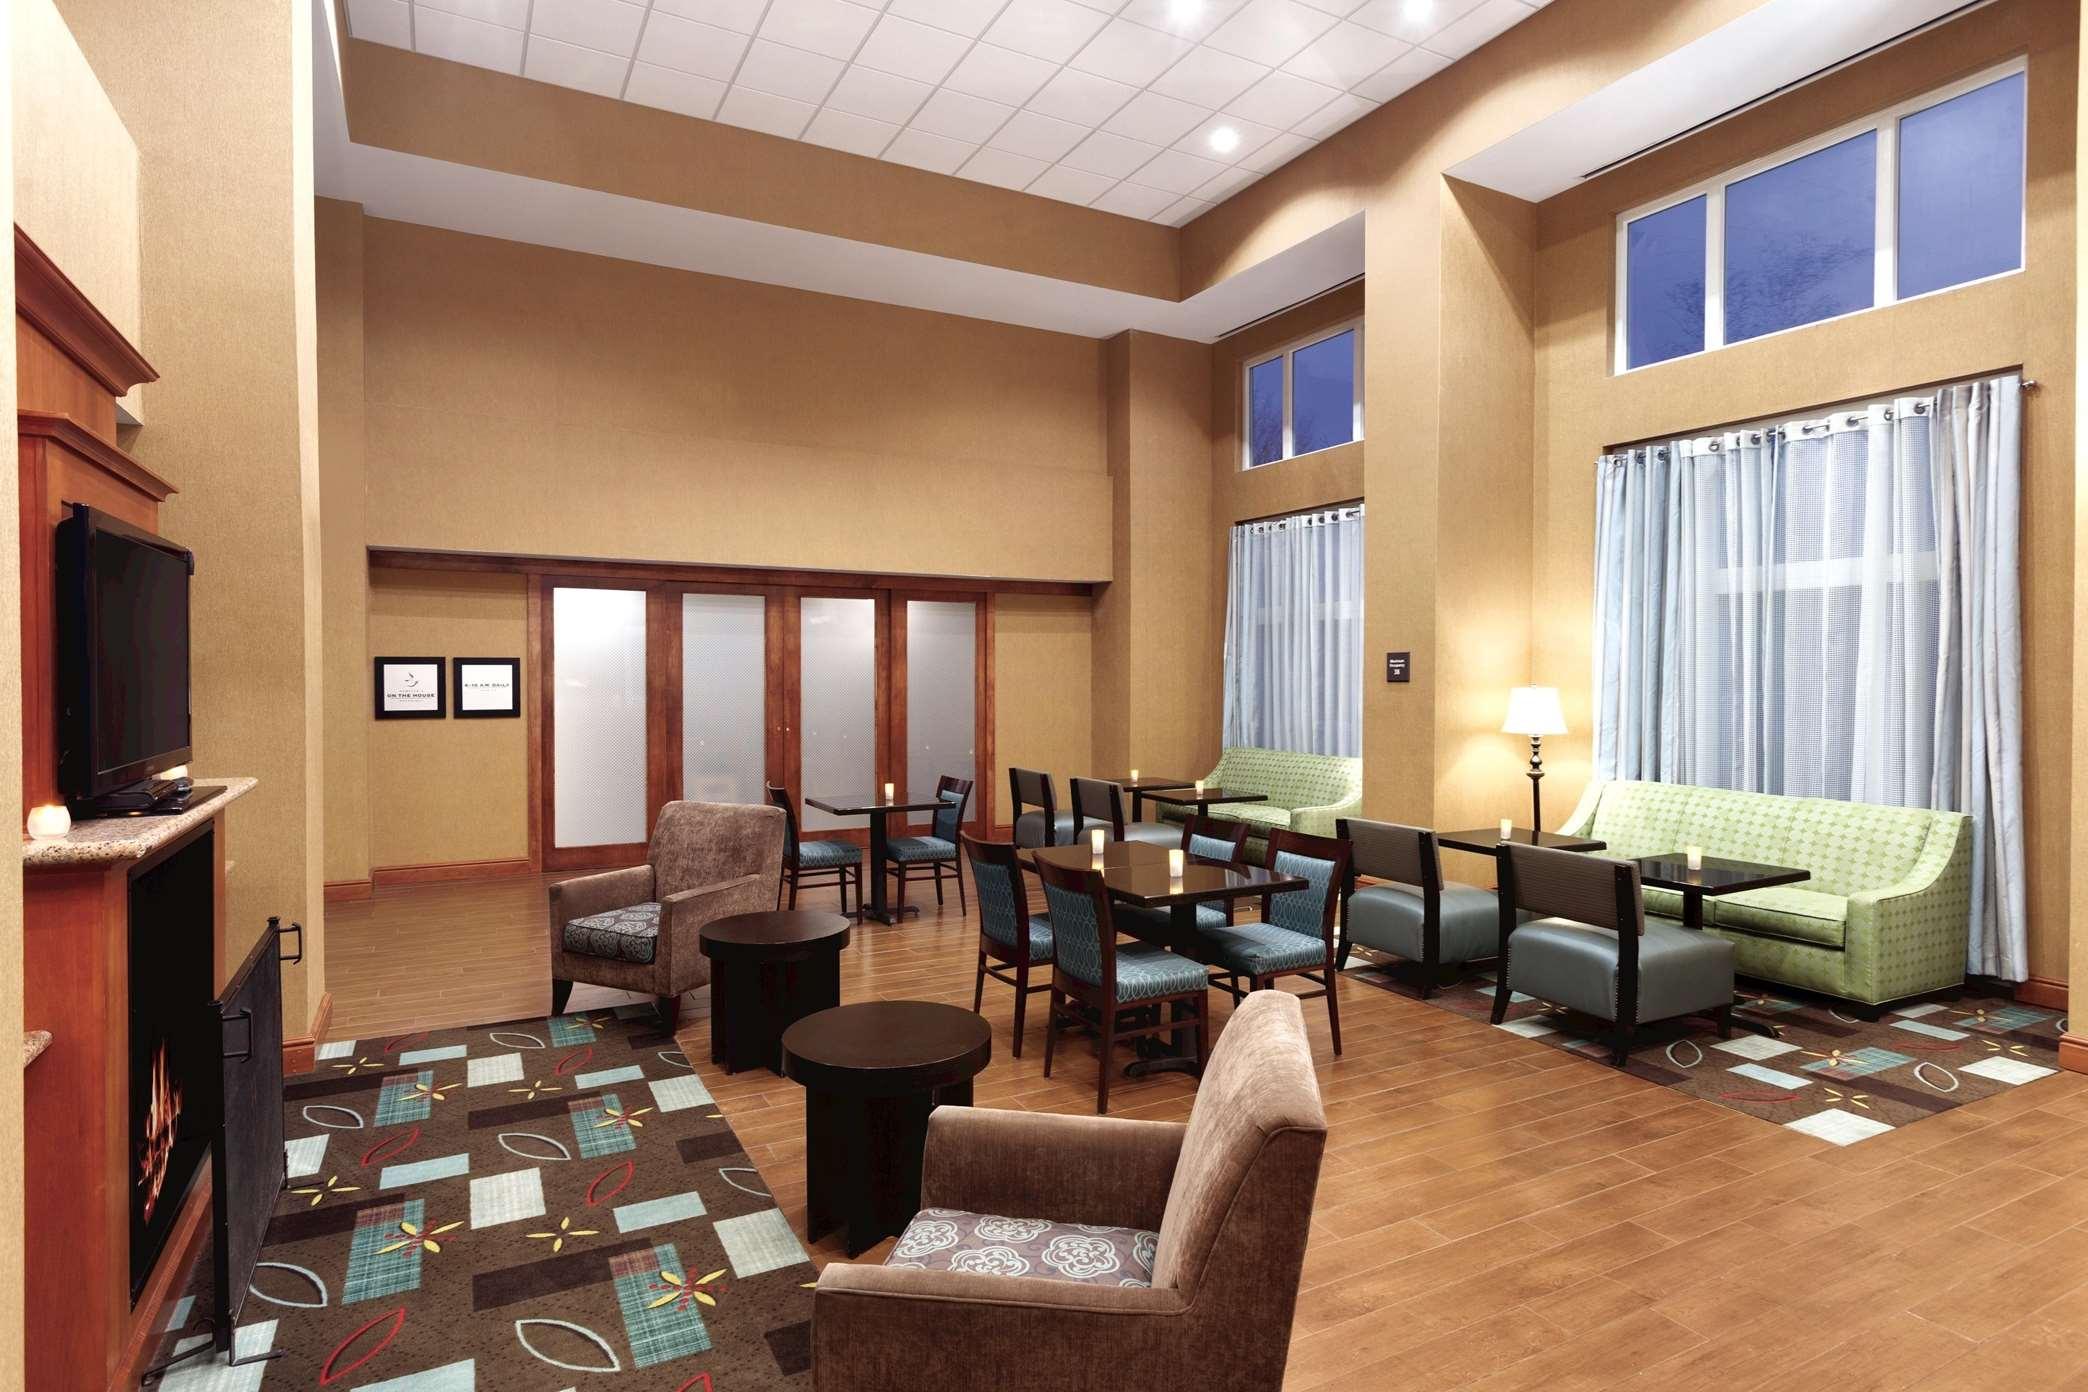 Hampton Inn & Suites Greenfield image 33